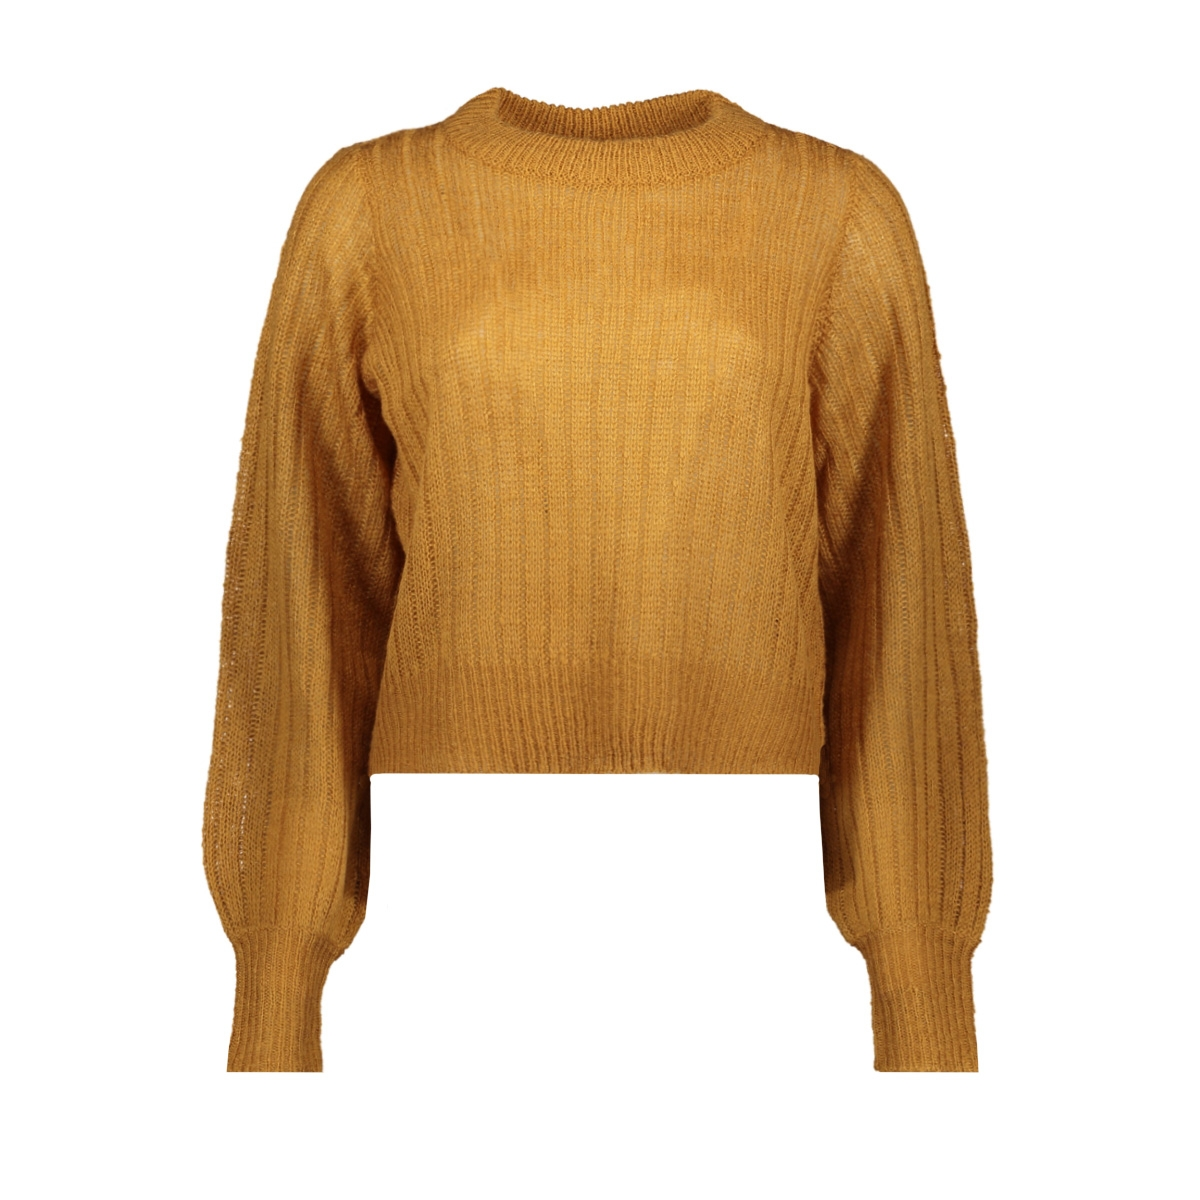 nmsabby l/s o-neck knit 27011413 noisy may trui brown sugar